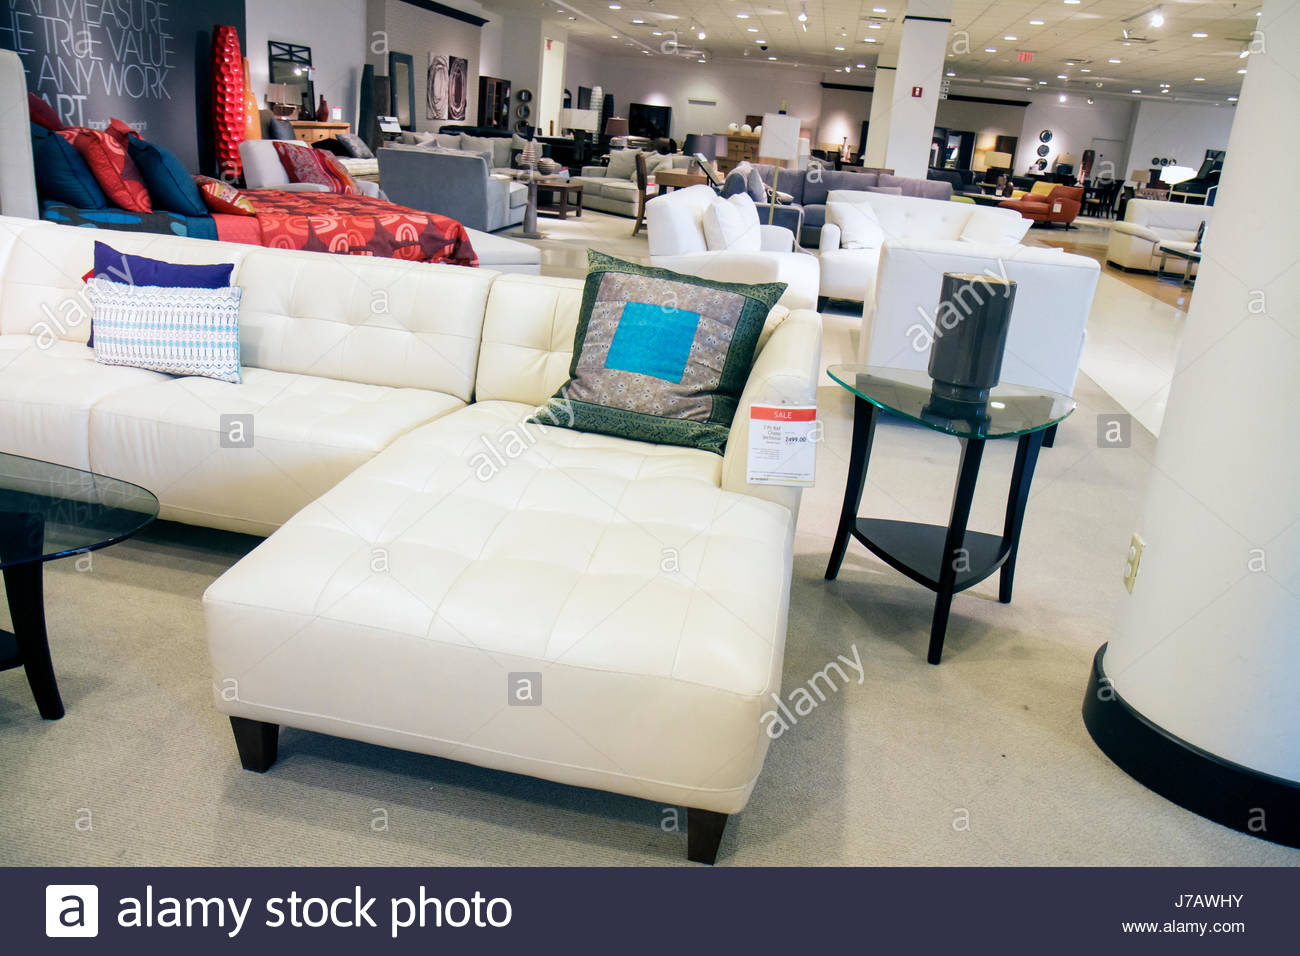 Miami Florida Aventura Macyu0027s Department Store Furniture Sofa Retail  Display For Sale Shopping